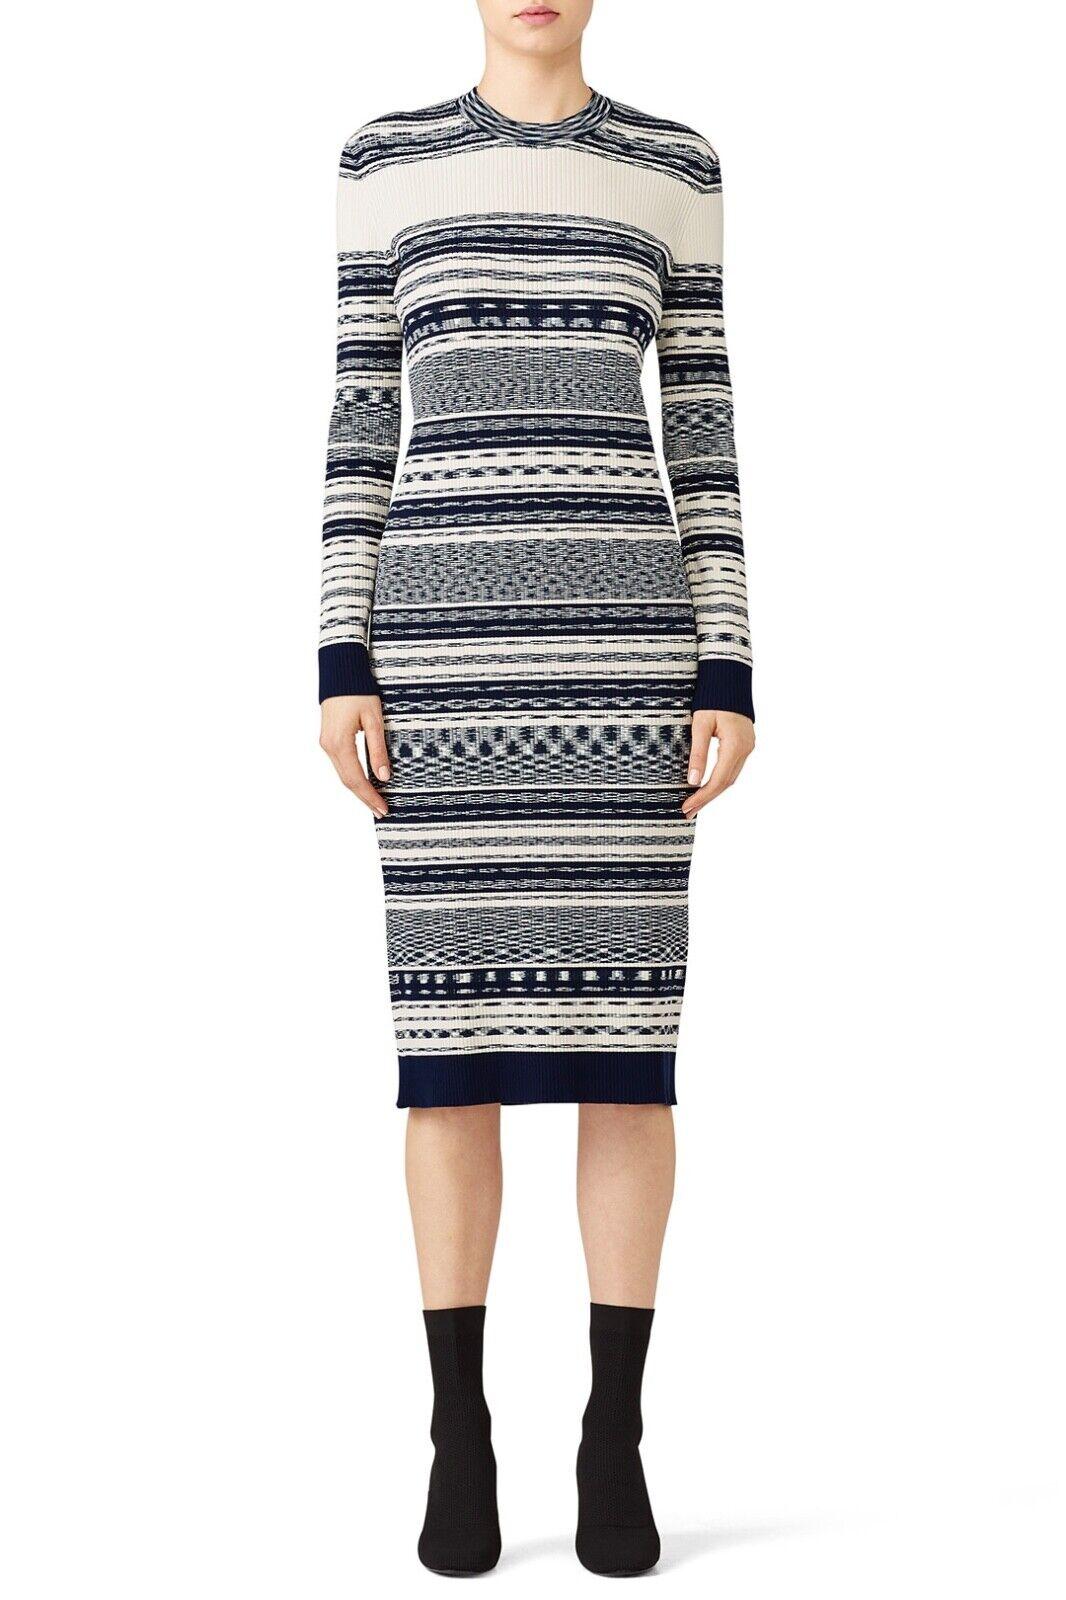 Tory Burch Julie Woherren Dress XL Ivory Navy Mixed Stripe Sweater Midi